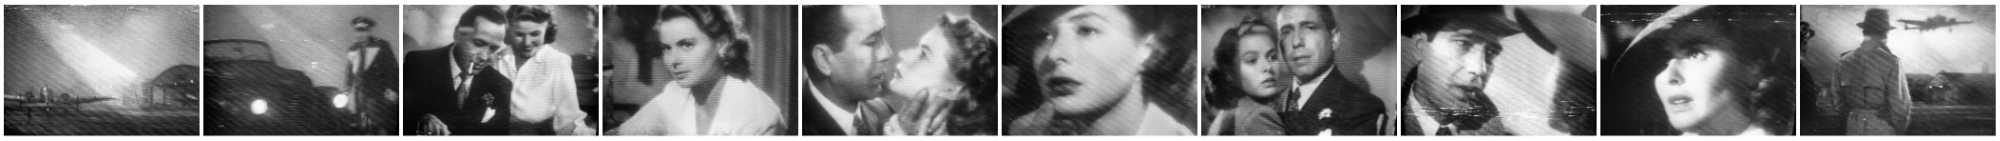 Serie »Abschied in Casablanca«, Kontaktstreifen, Fotos © Friedhelm Denkeler 1989